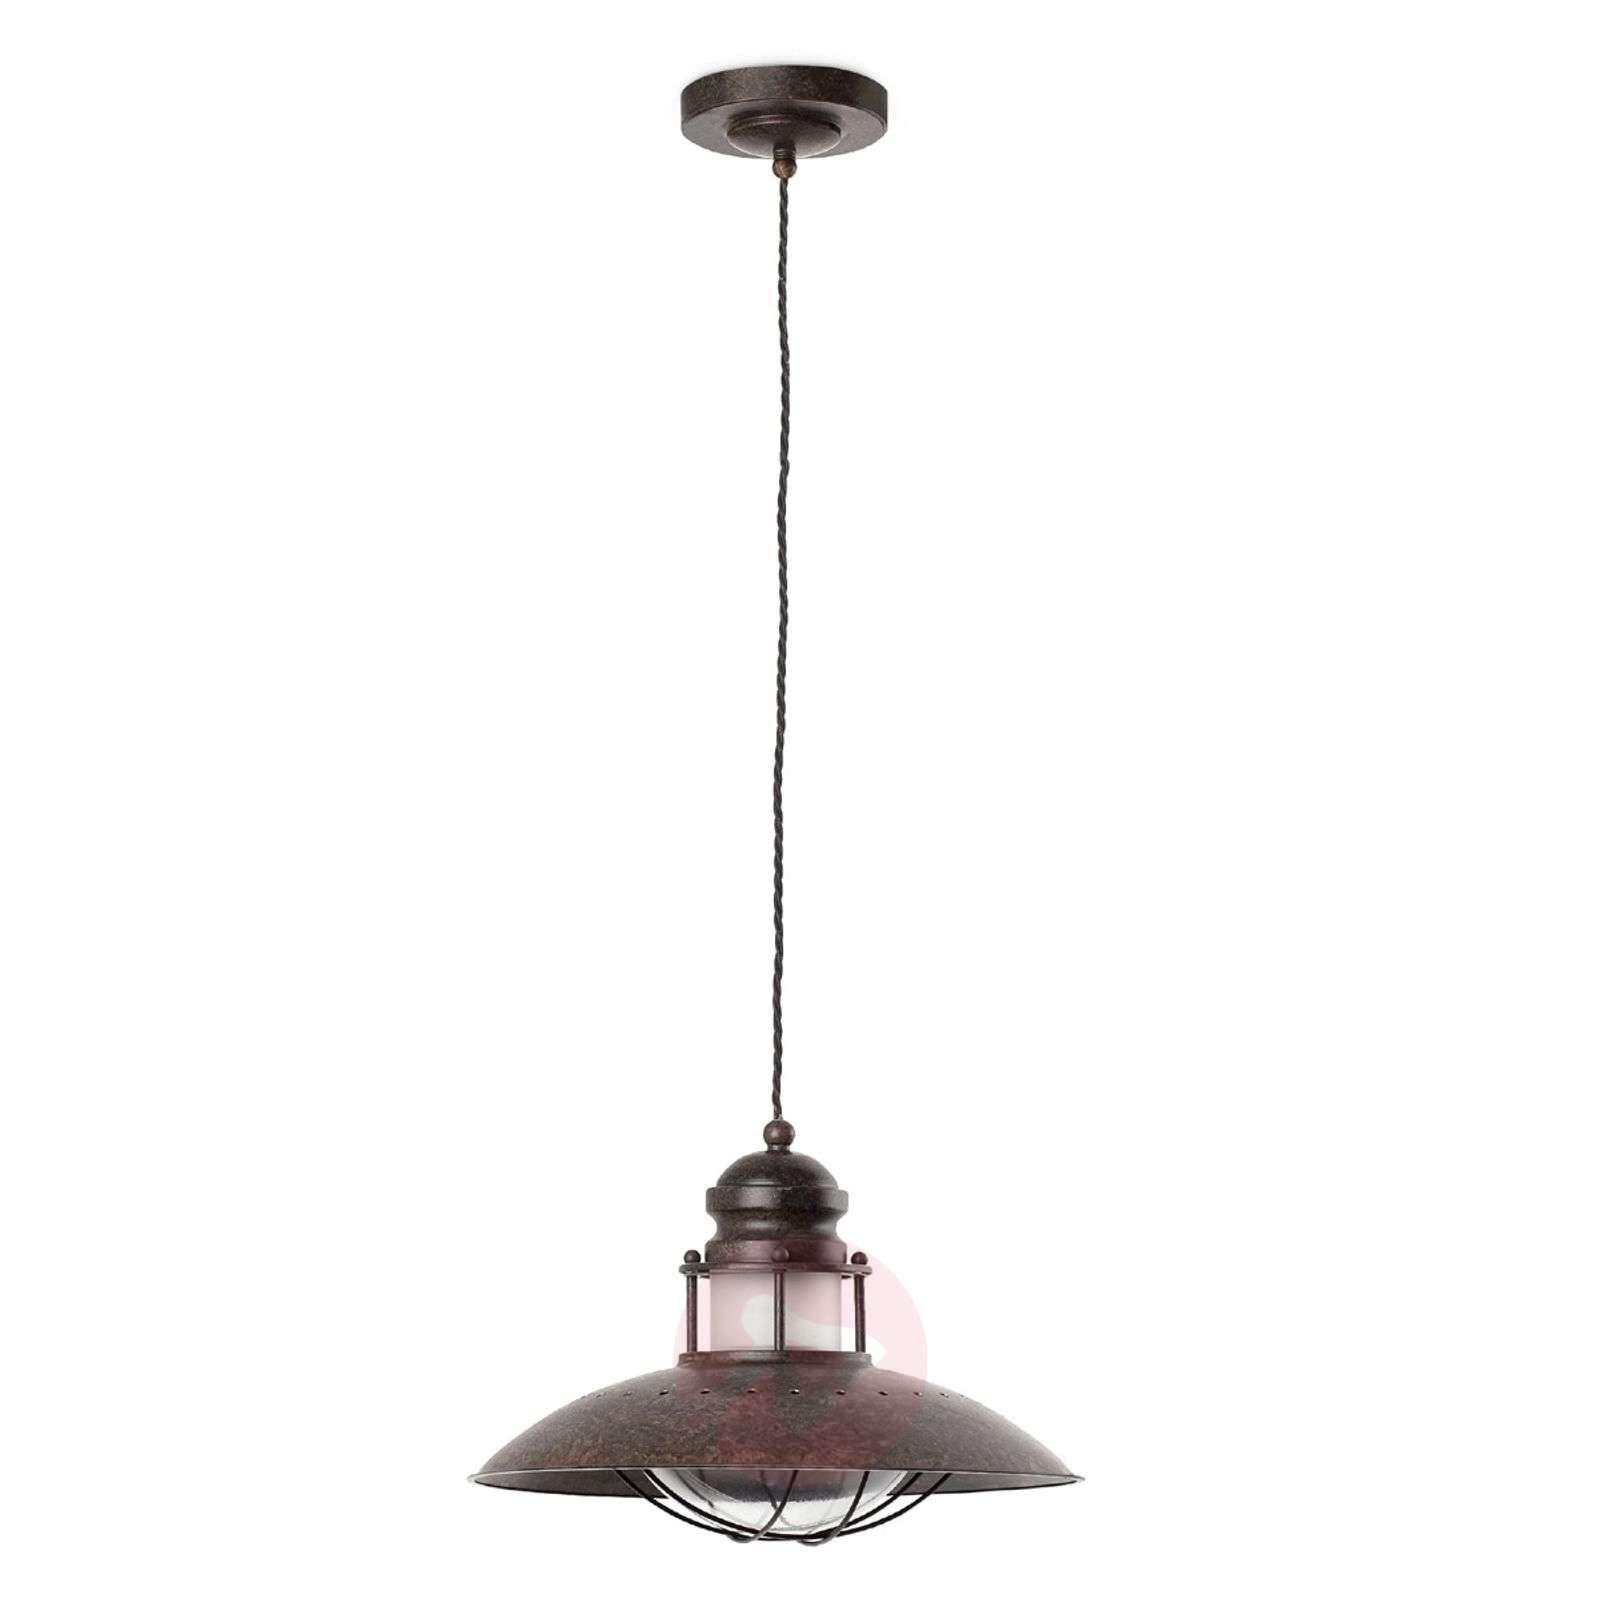 Decorative Winch Pendant Lamp-3507035-01